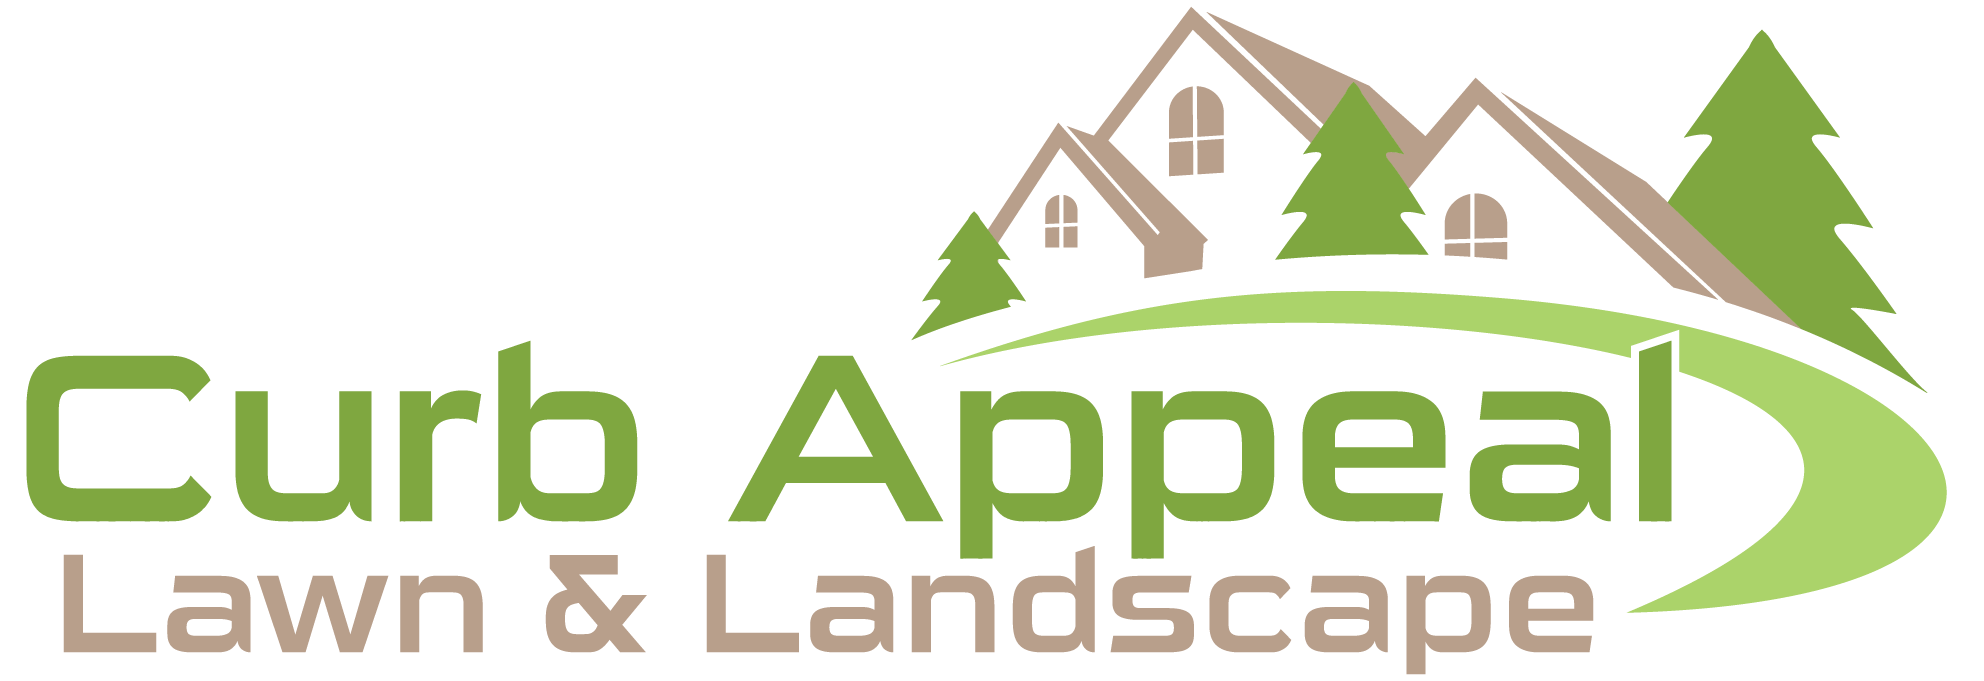 curb_appeal_logo-01.png